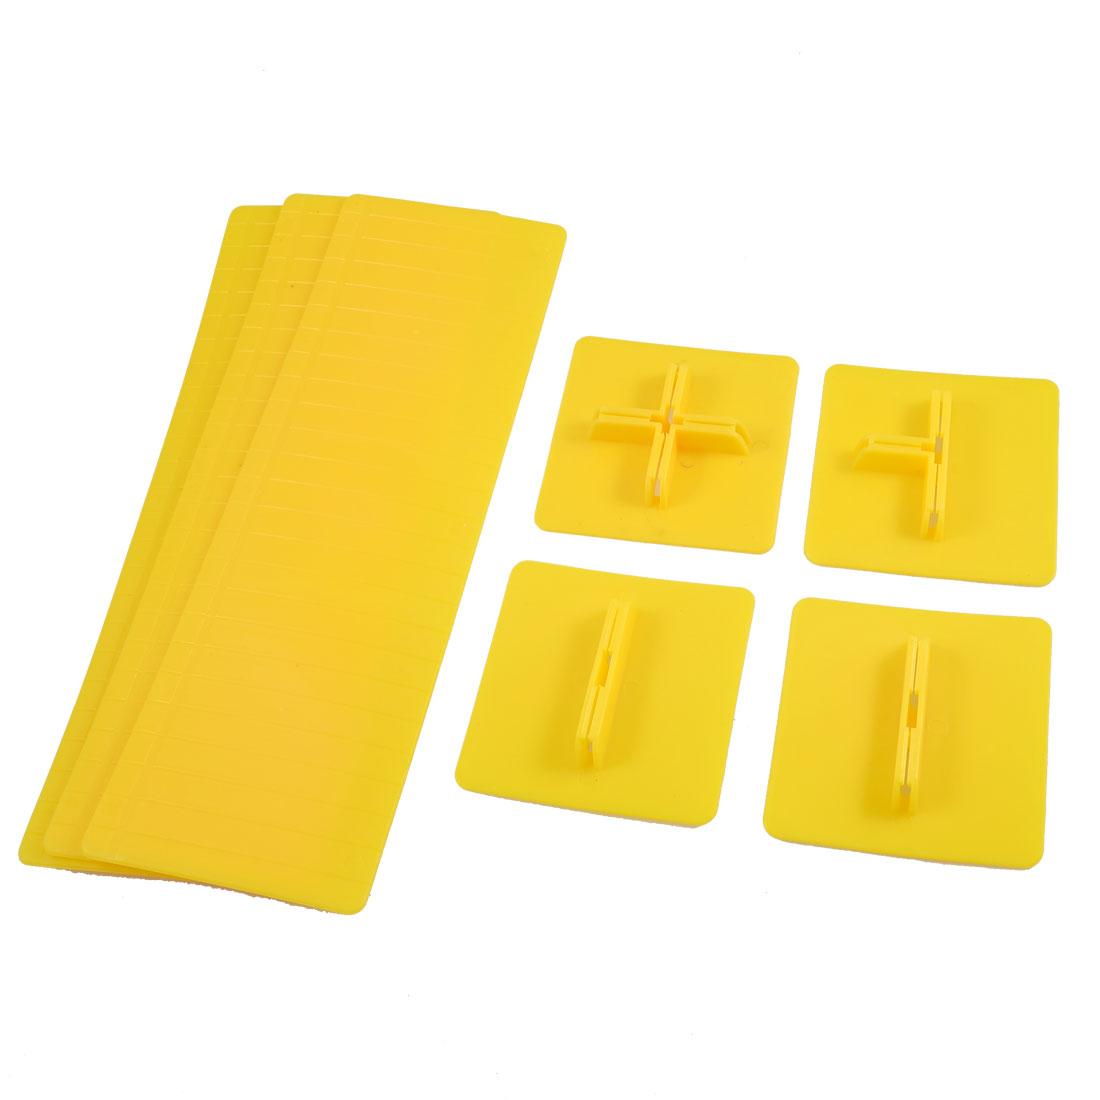 7 Pcs Plastic Grid Tidy Drawer Divider Storage Organizer Set